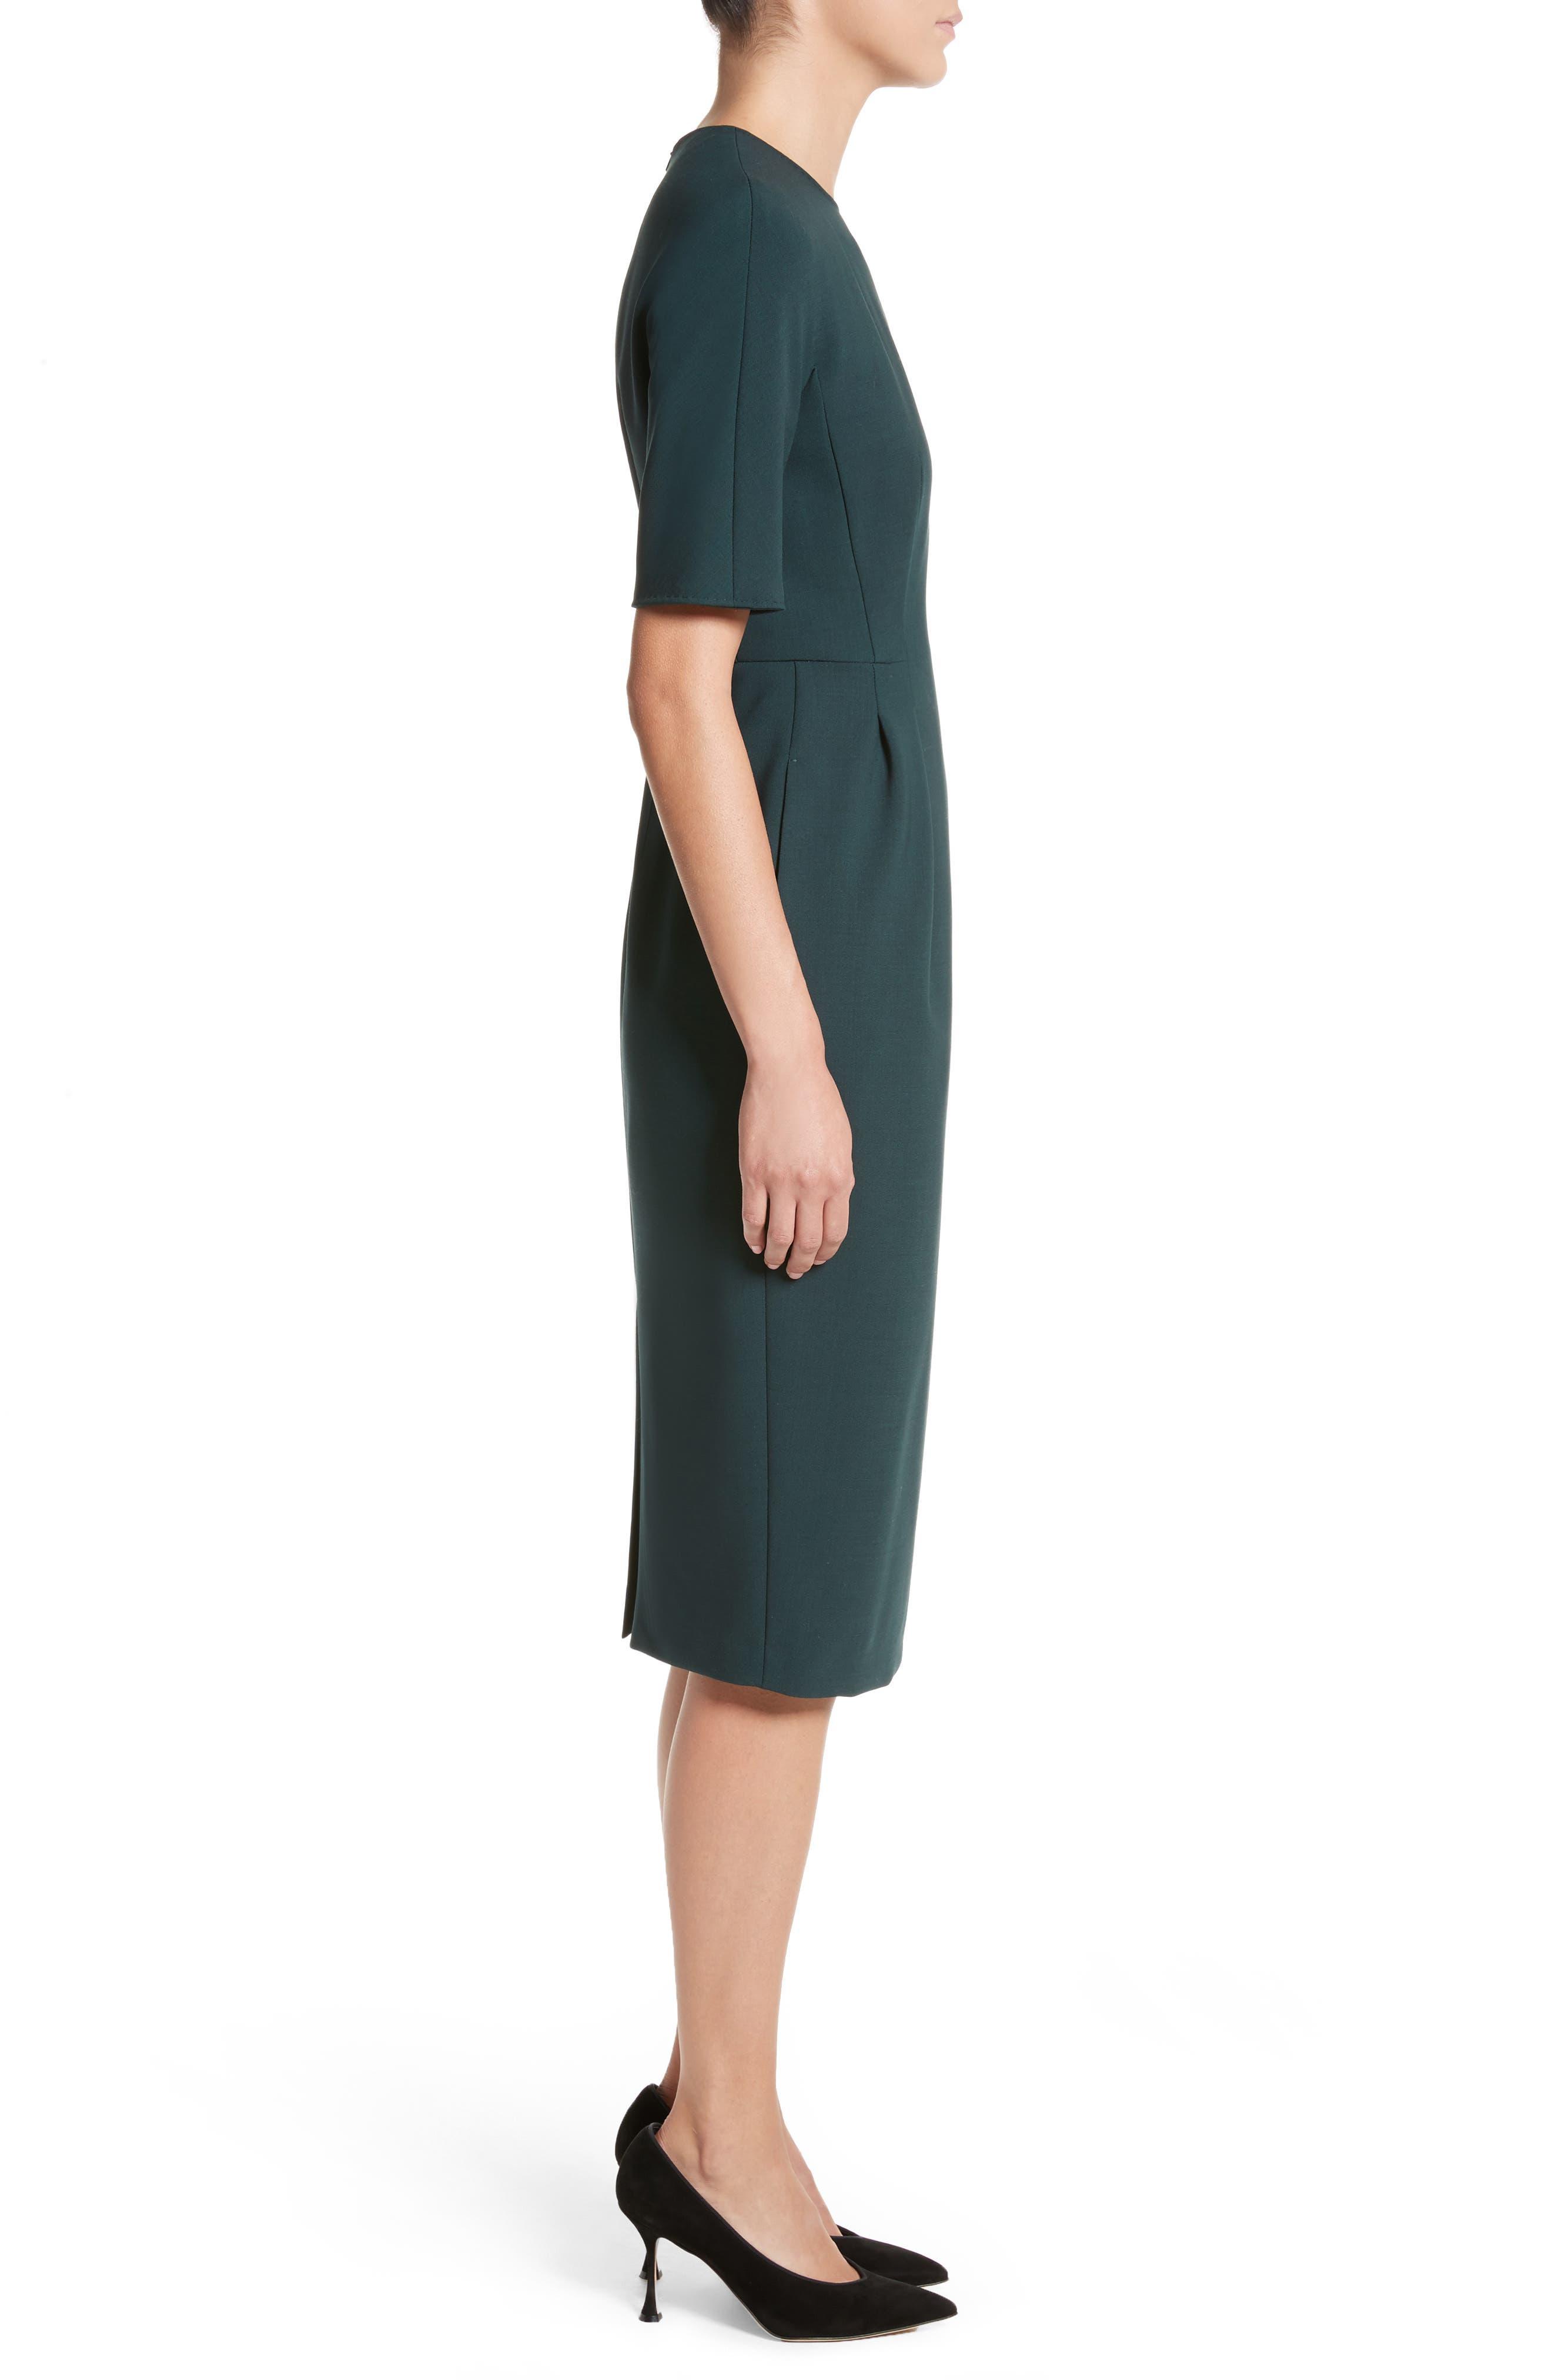 Umano Stretch Wool Sheath Dress,                             Alternate thumbnail 3, color,                             Dark Green